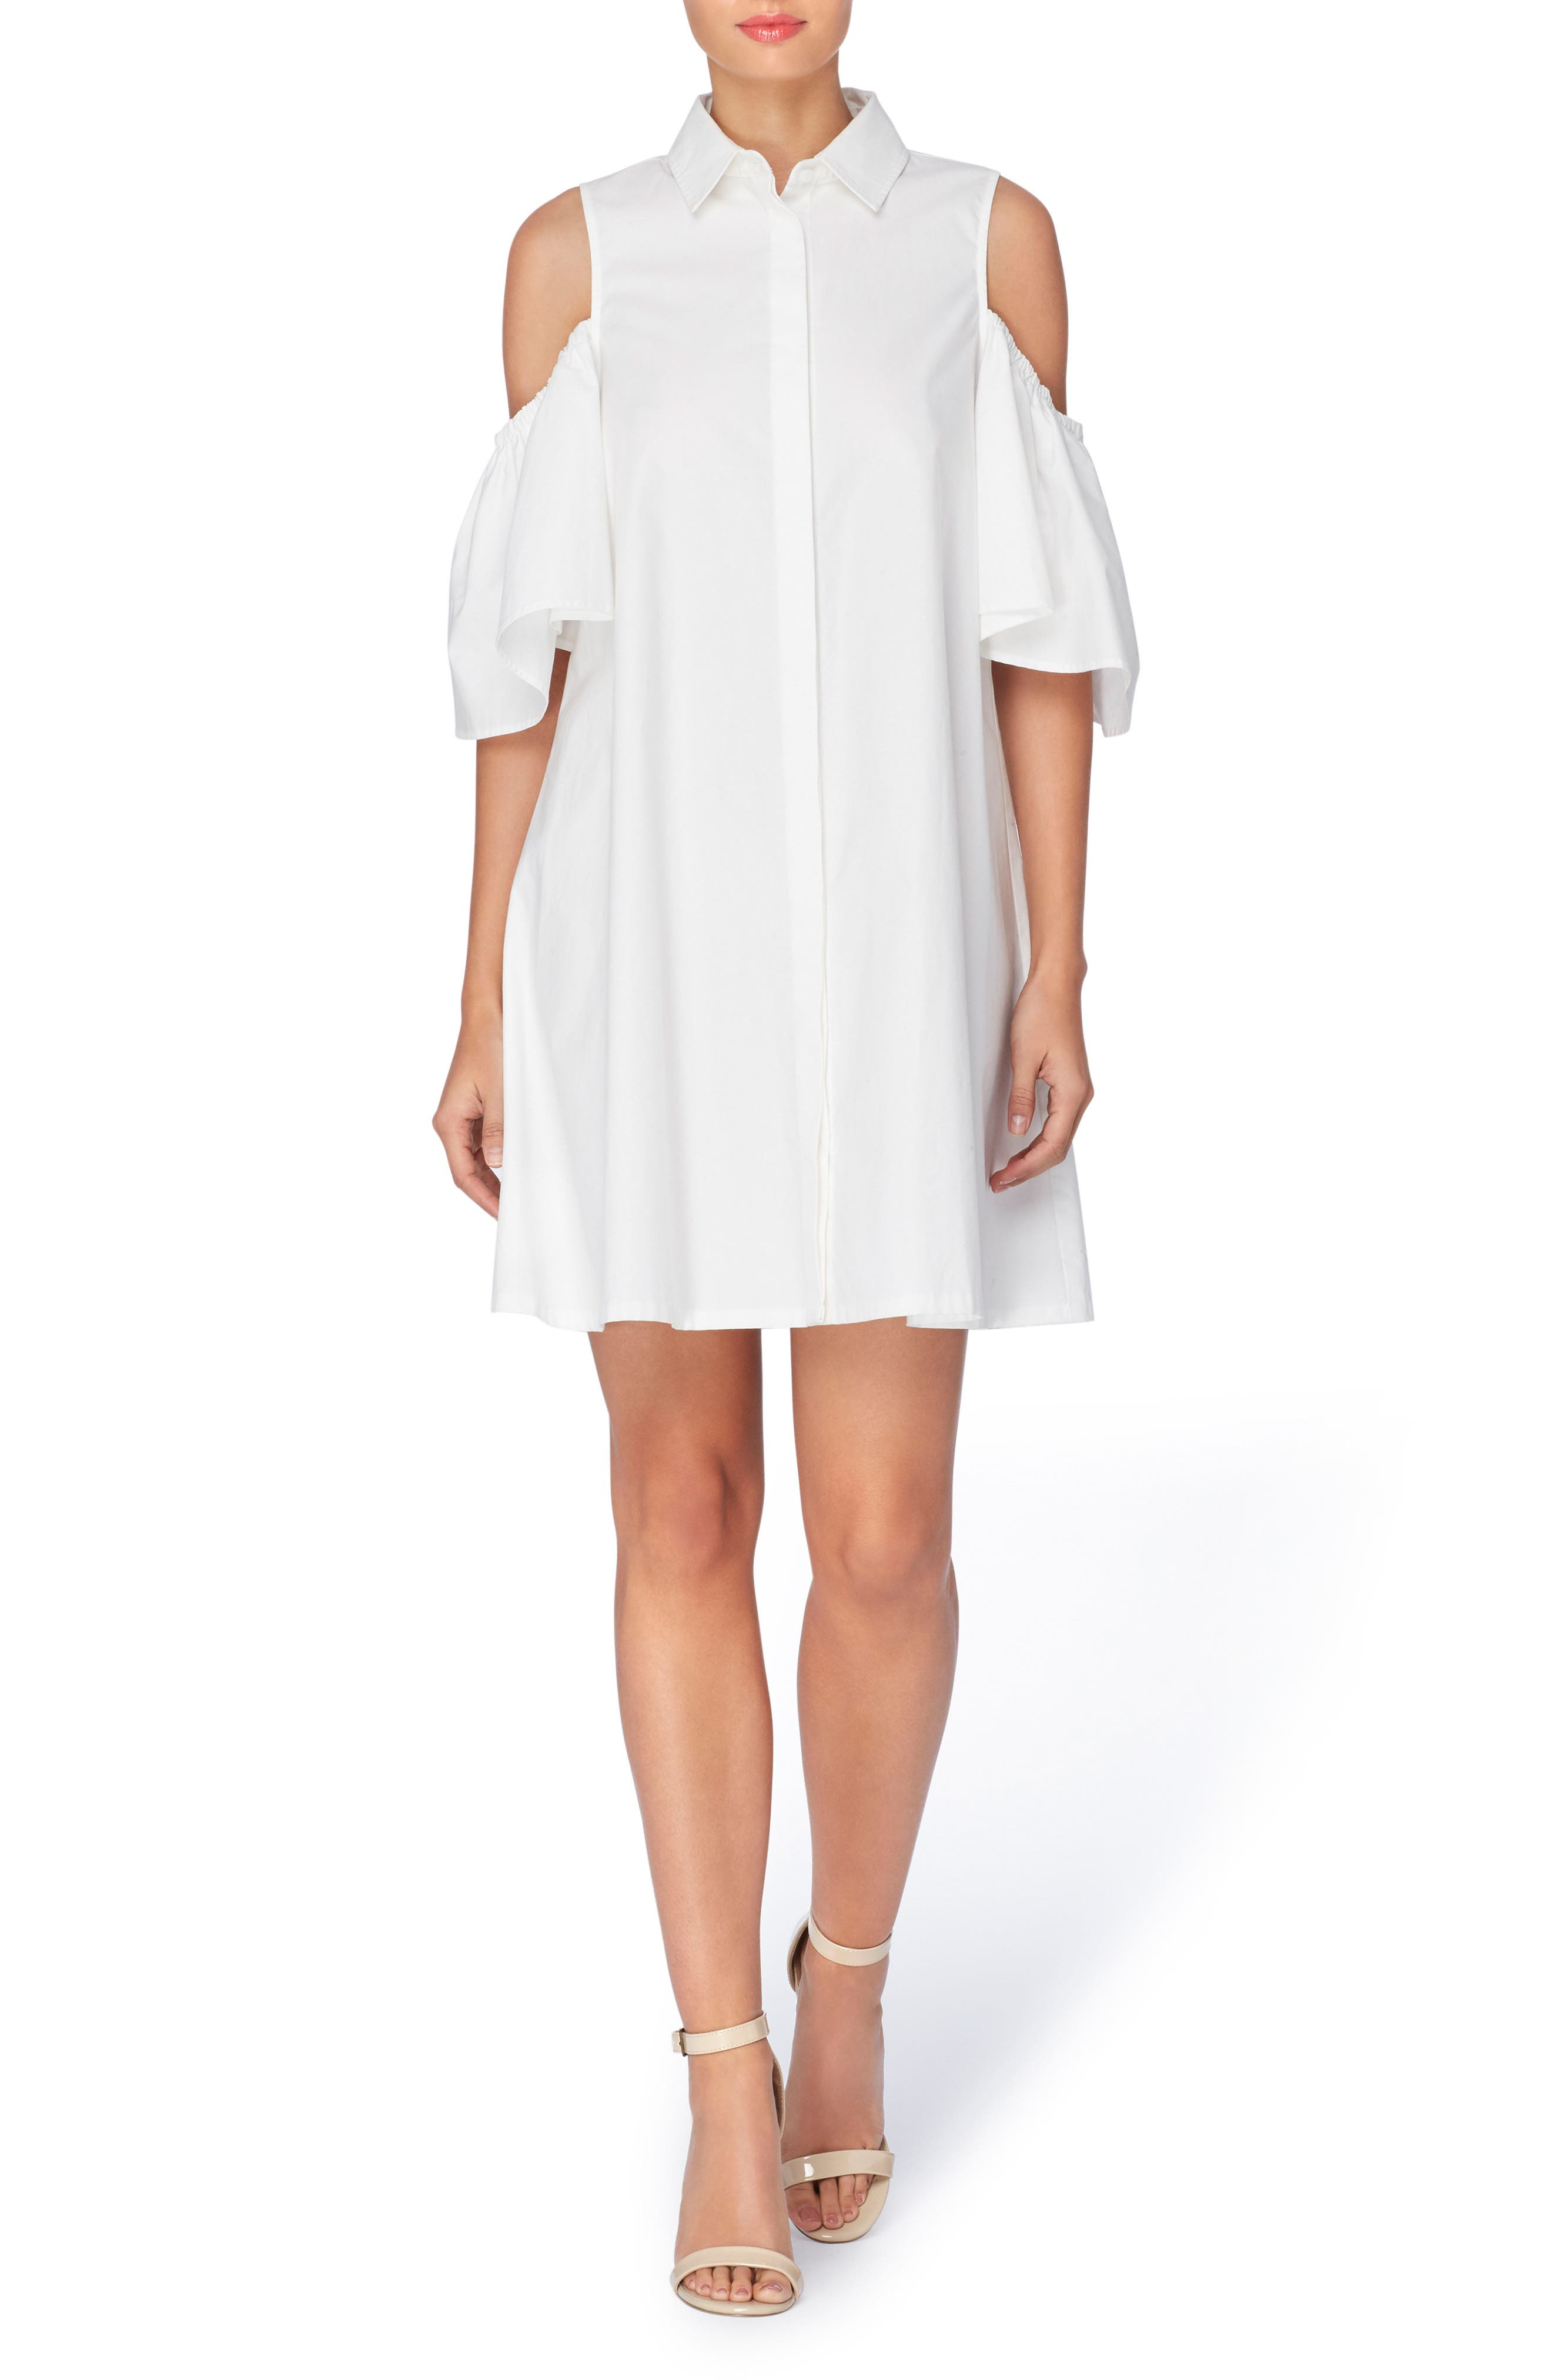 CATHERINE CATHERINE MALANDRINO Zito Cold Shoulder Shirtdress